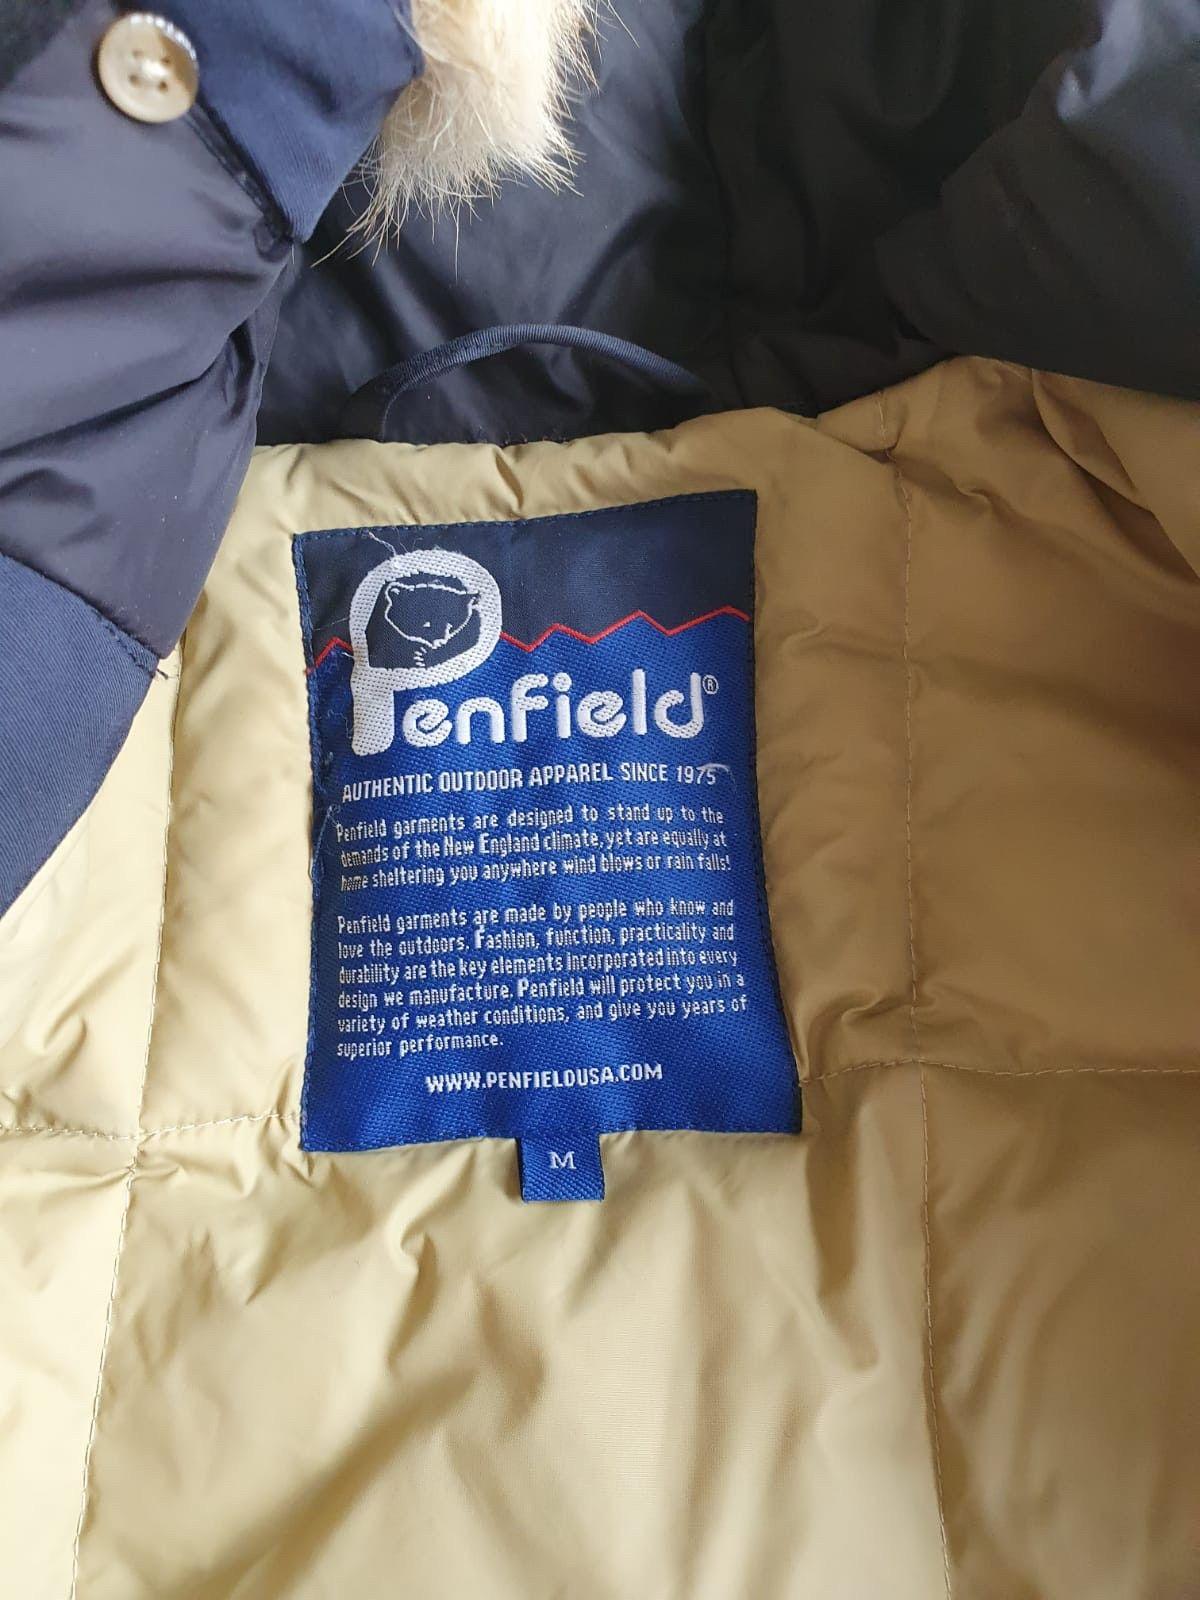 Penfield jakke til dame str S | FINN.no